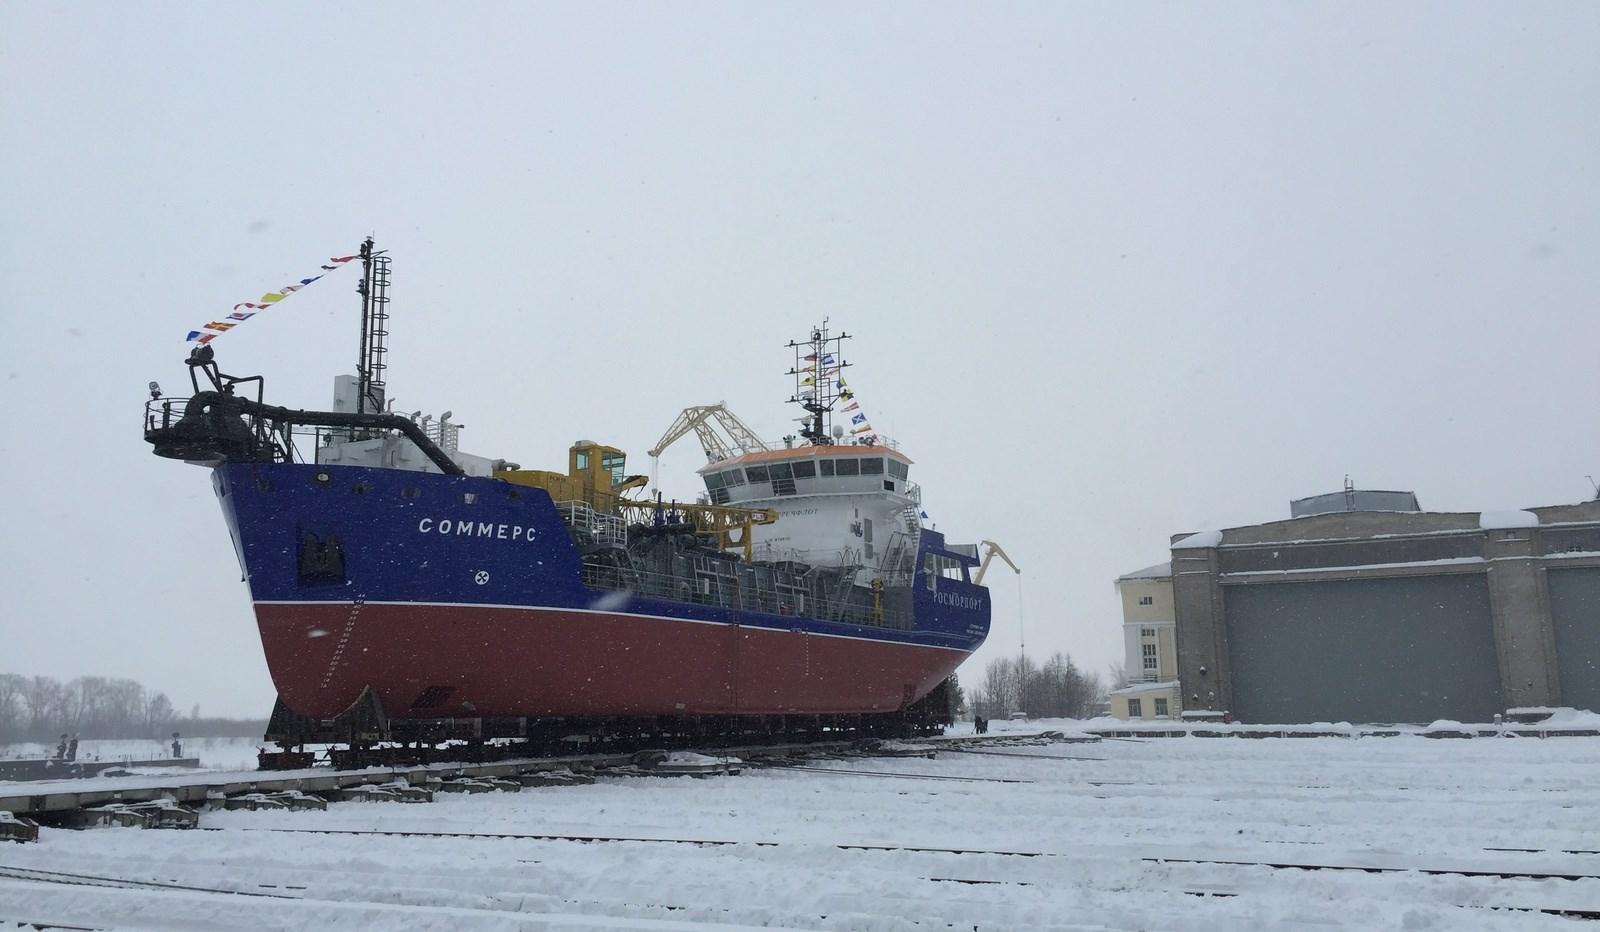 PLM 1215 dredging crane